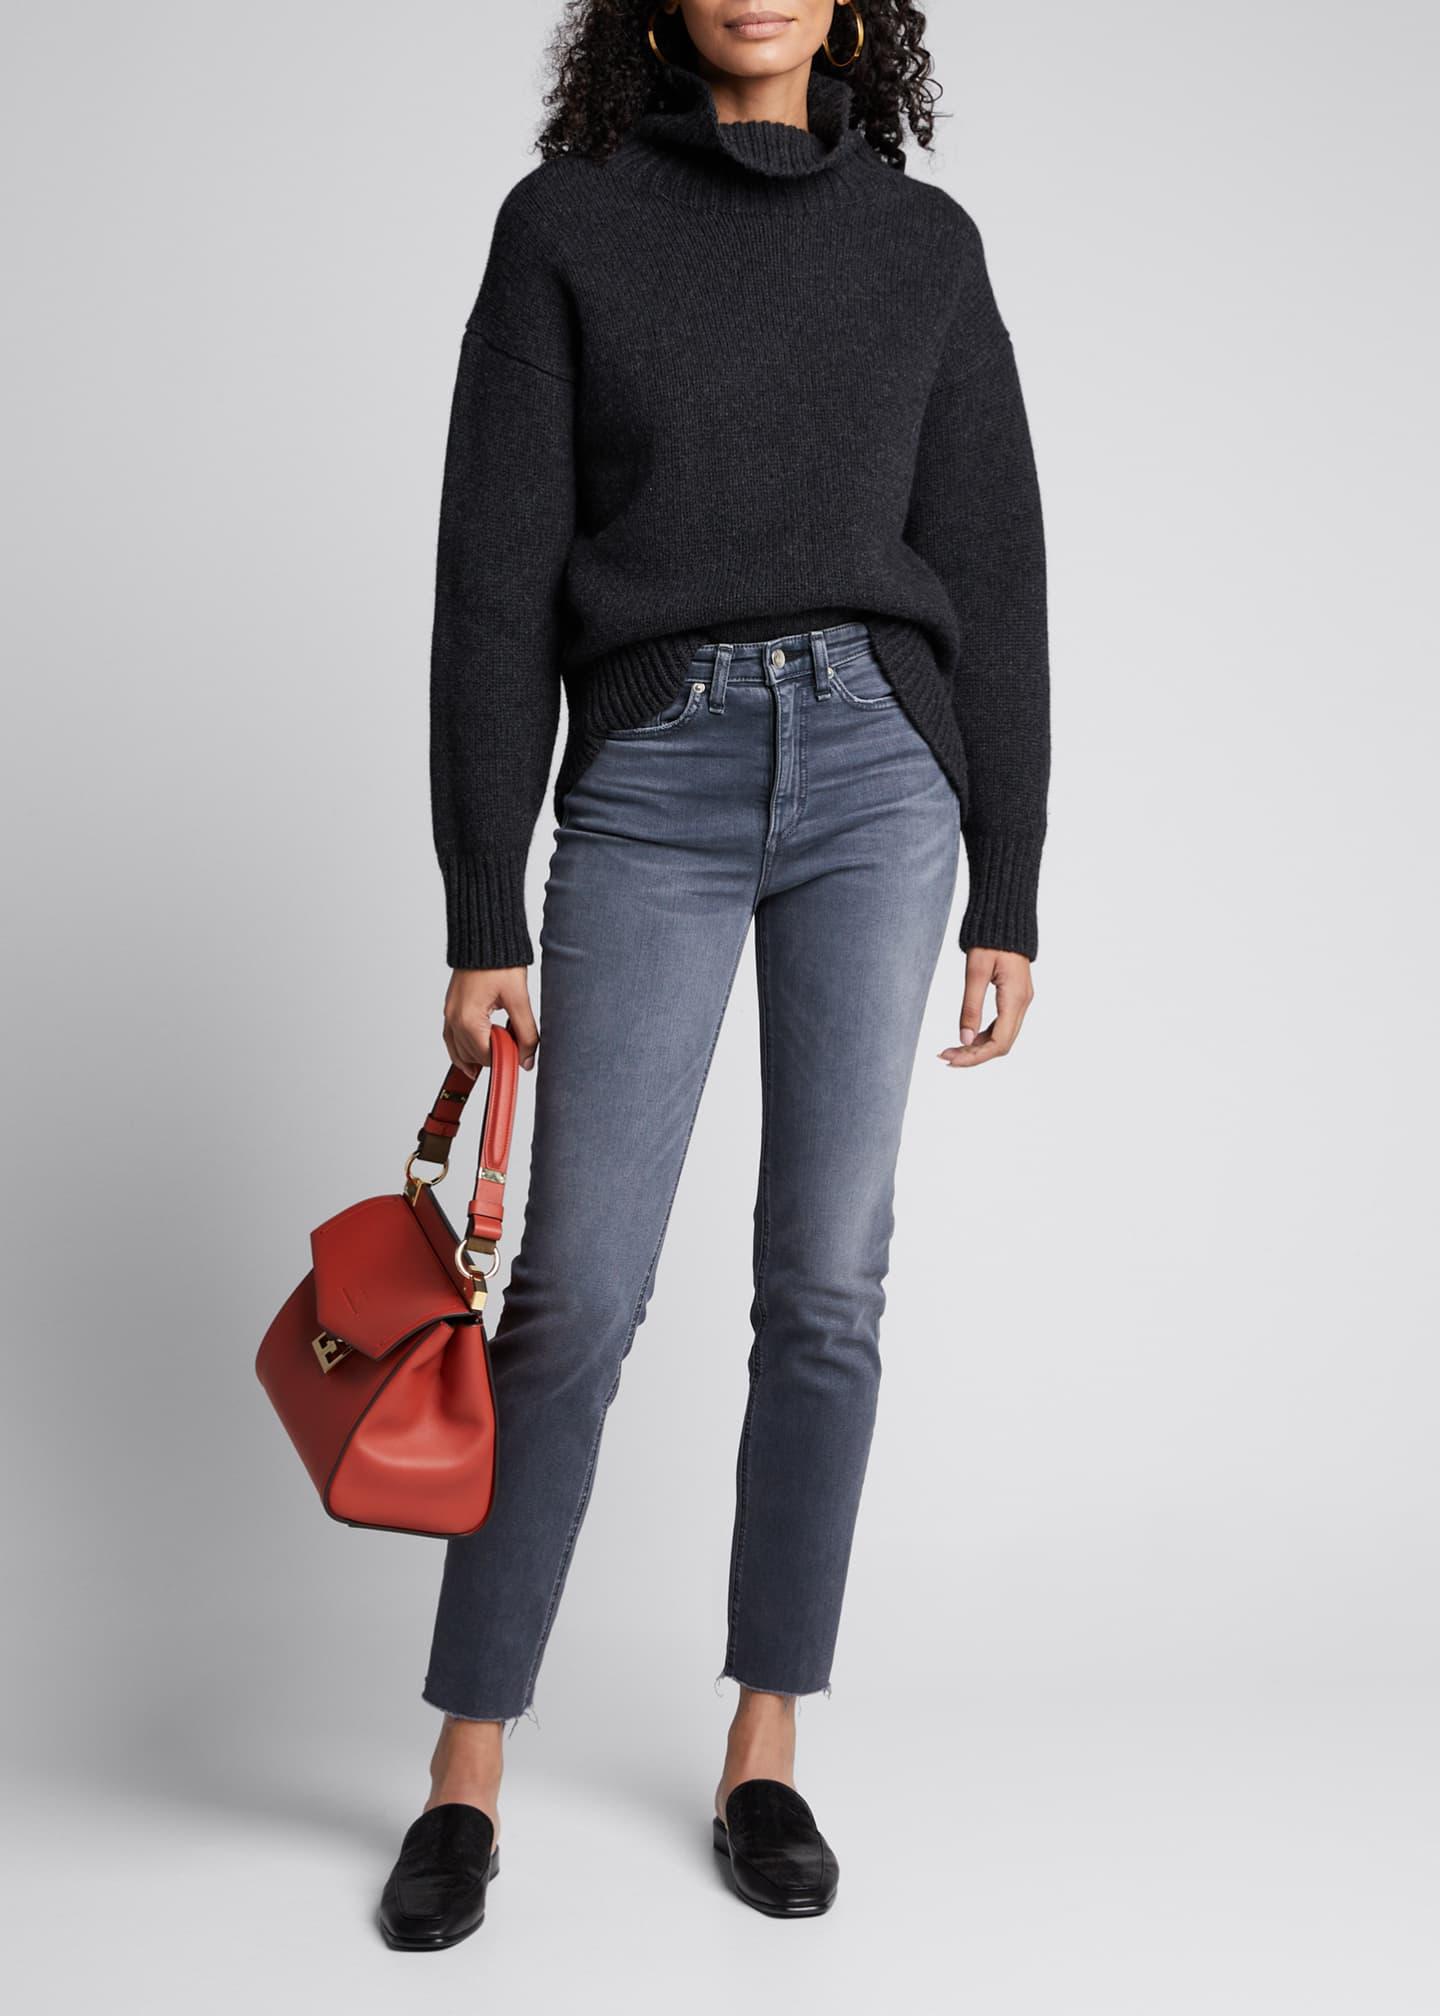 Rag & Bone Nina High-Rise Cigarette Cropped Jeans